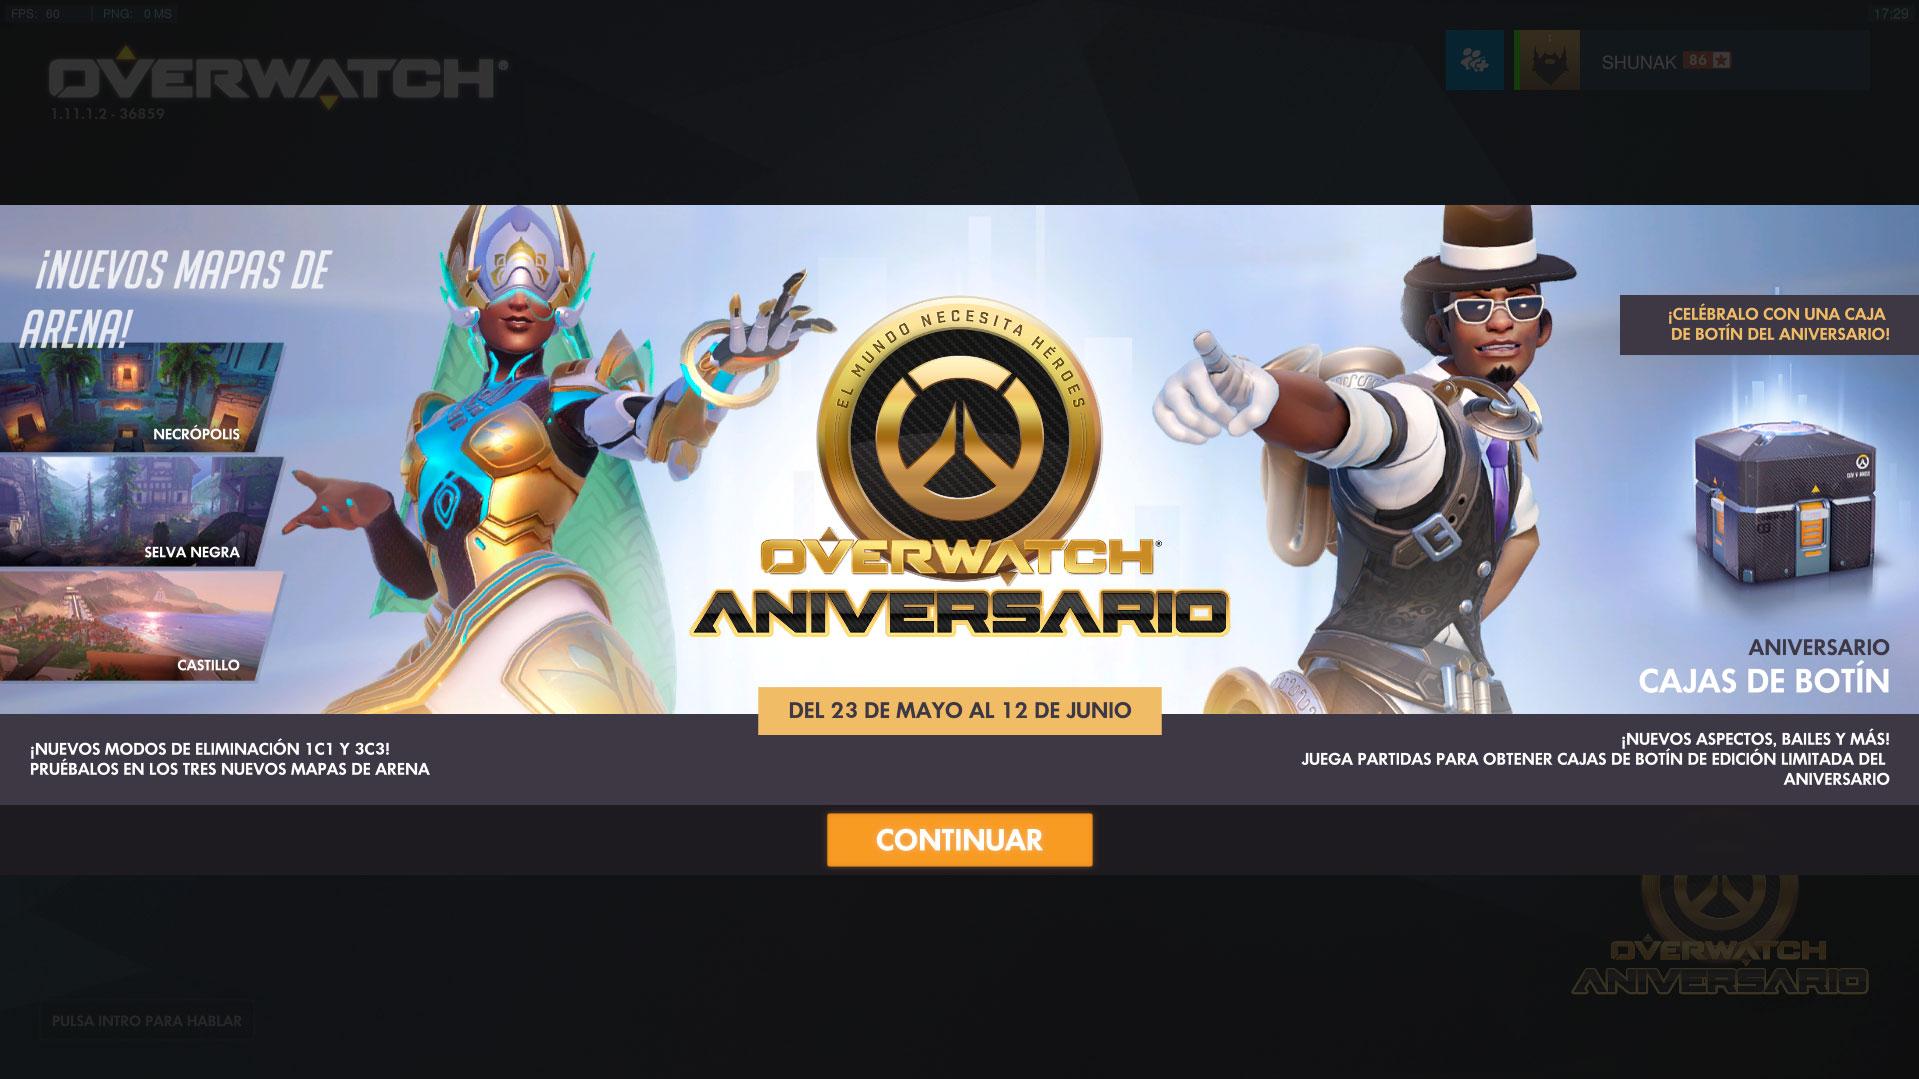 Overwatch: Aniversario